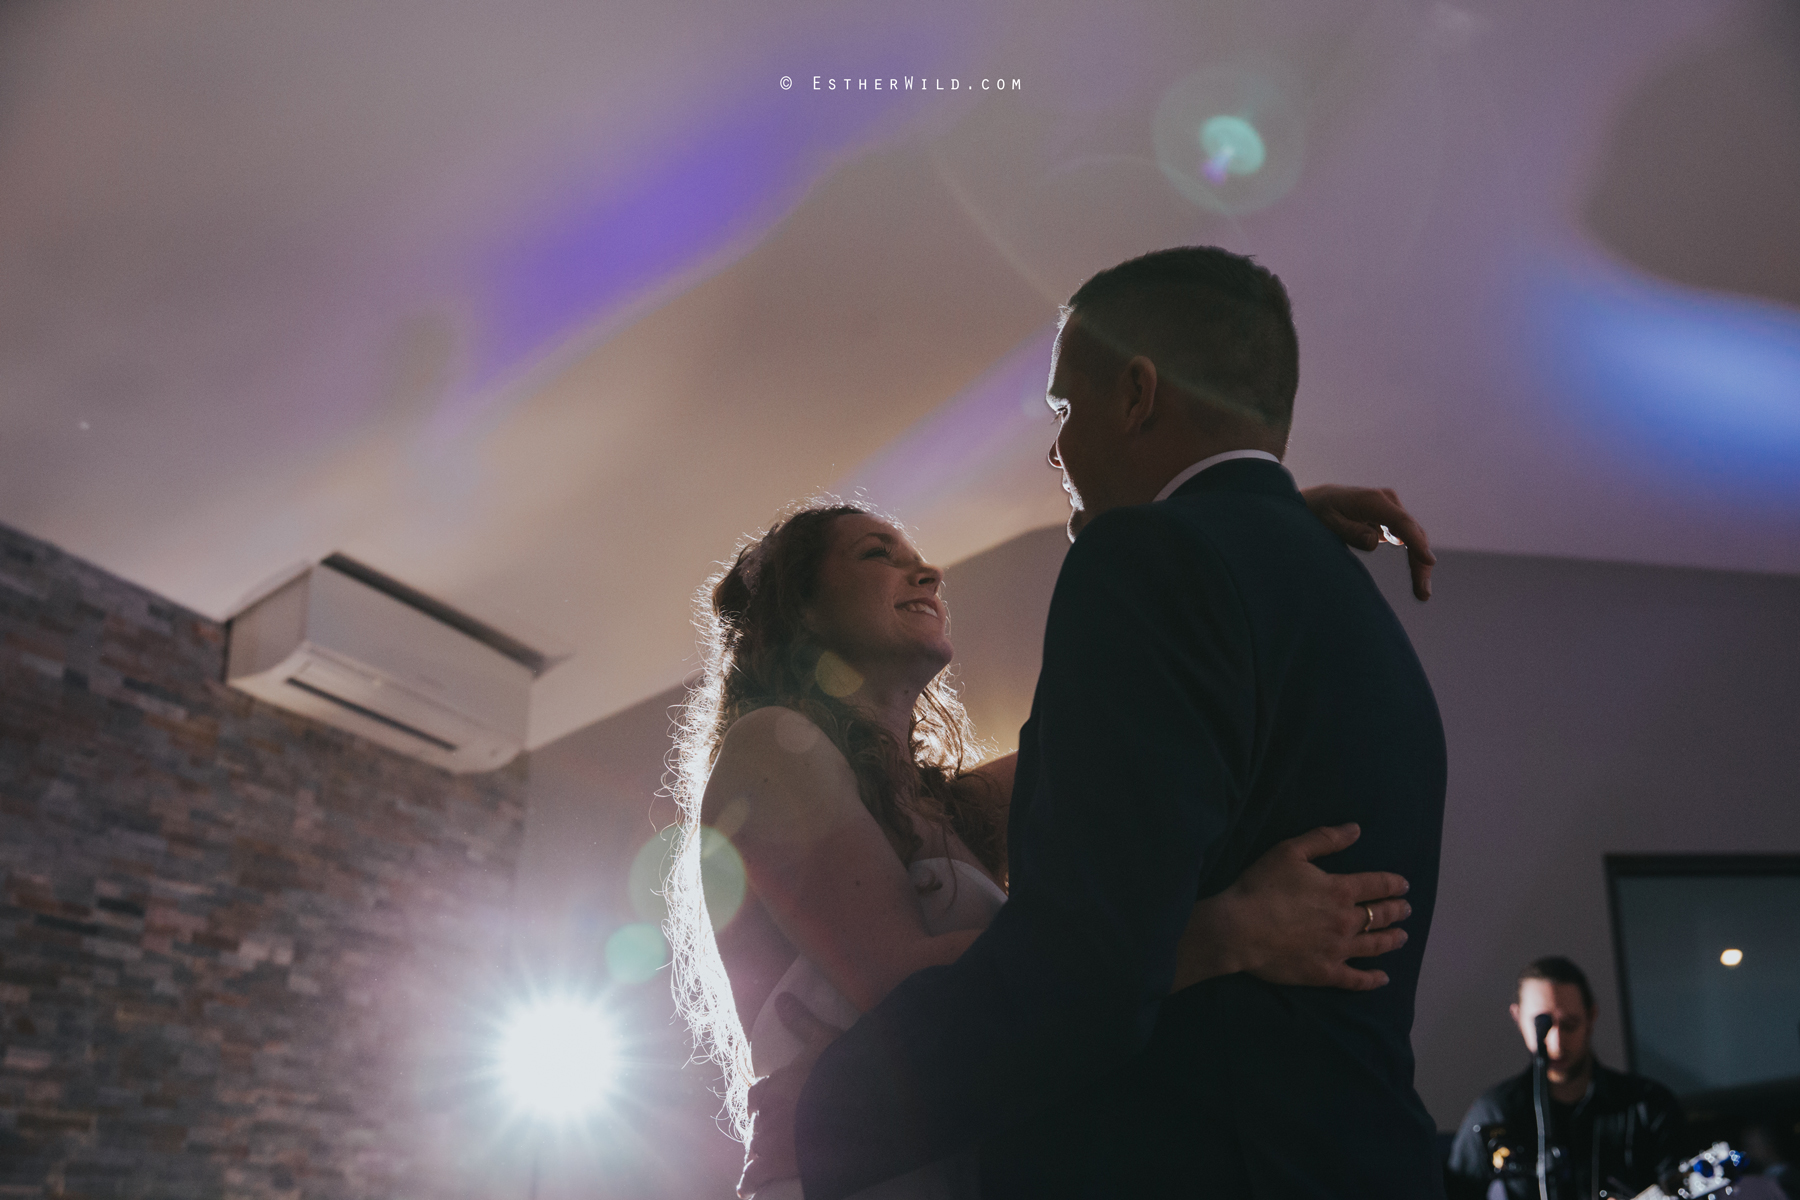 The_BoatHouse_Wedding_Venue_Ormesby_Norfolk_Broads_Boat_Wedding_Photography_Esther_Wild_Photographer_IMG_3567.jpg